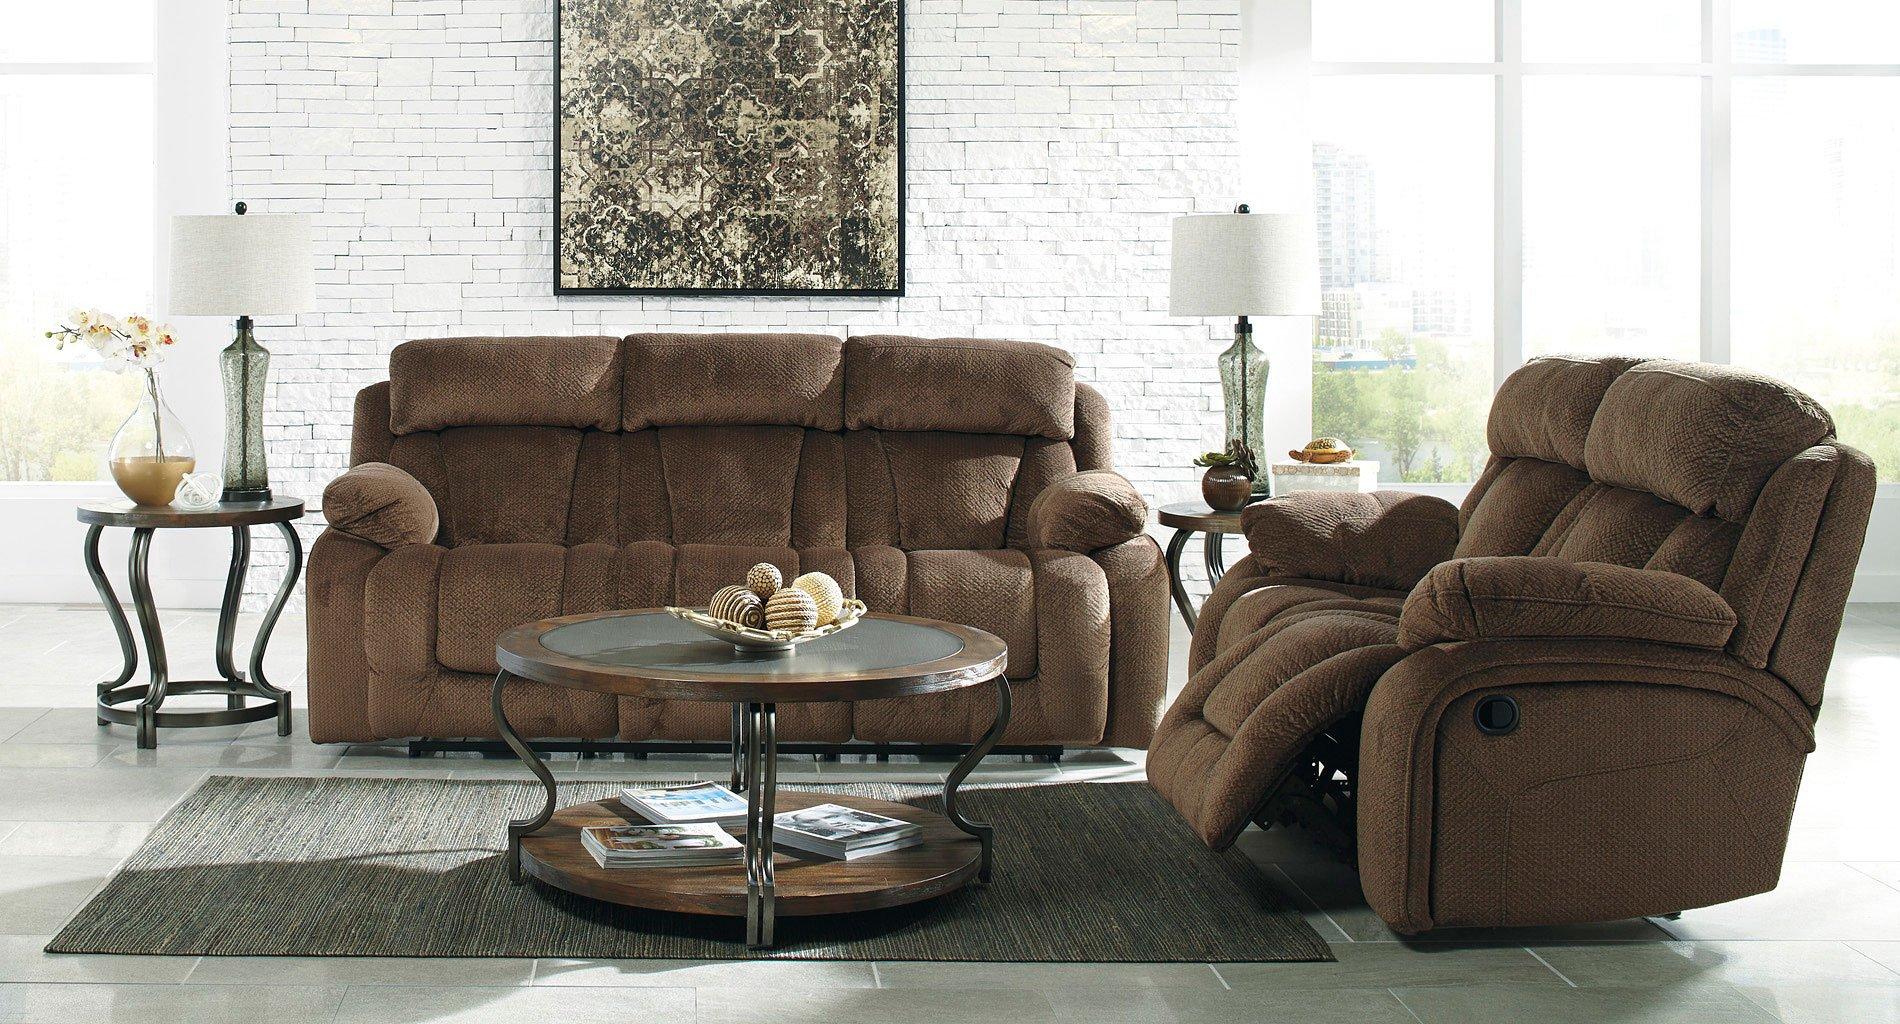 Swell Stricklin Chocolate Power Reclining Living Room Set Andrewgaddart Wooden Chair Designs For Living Room Andrewgaddartcom